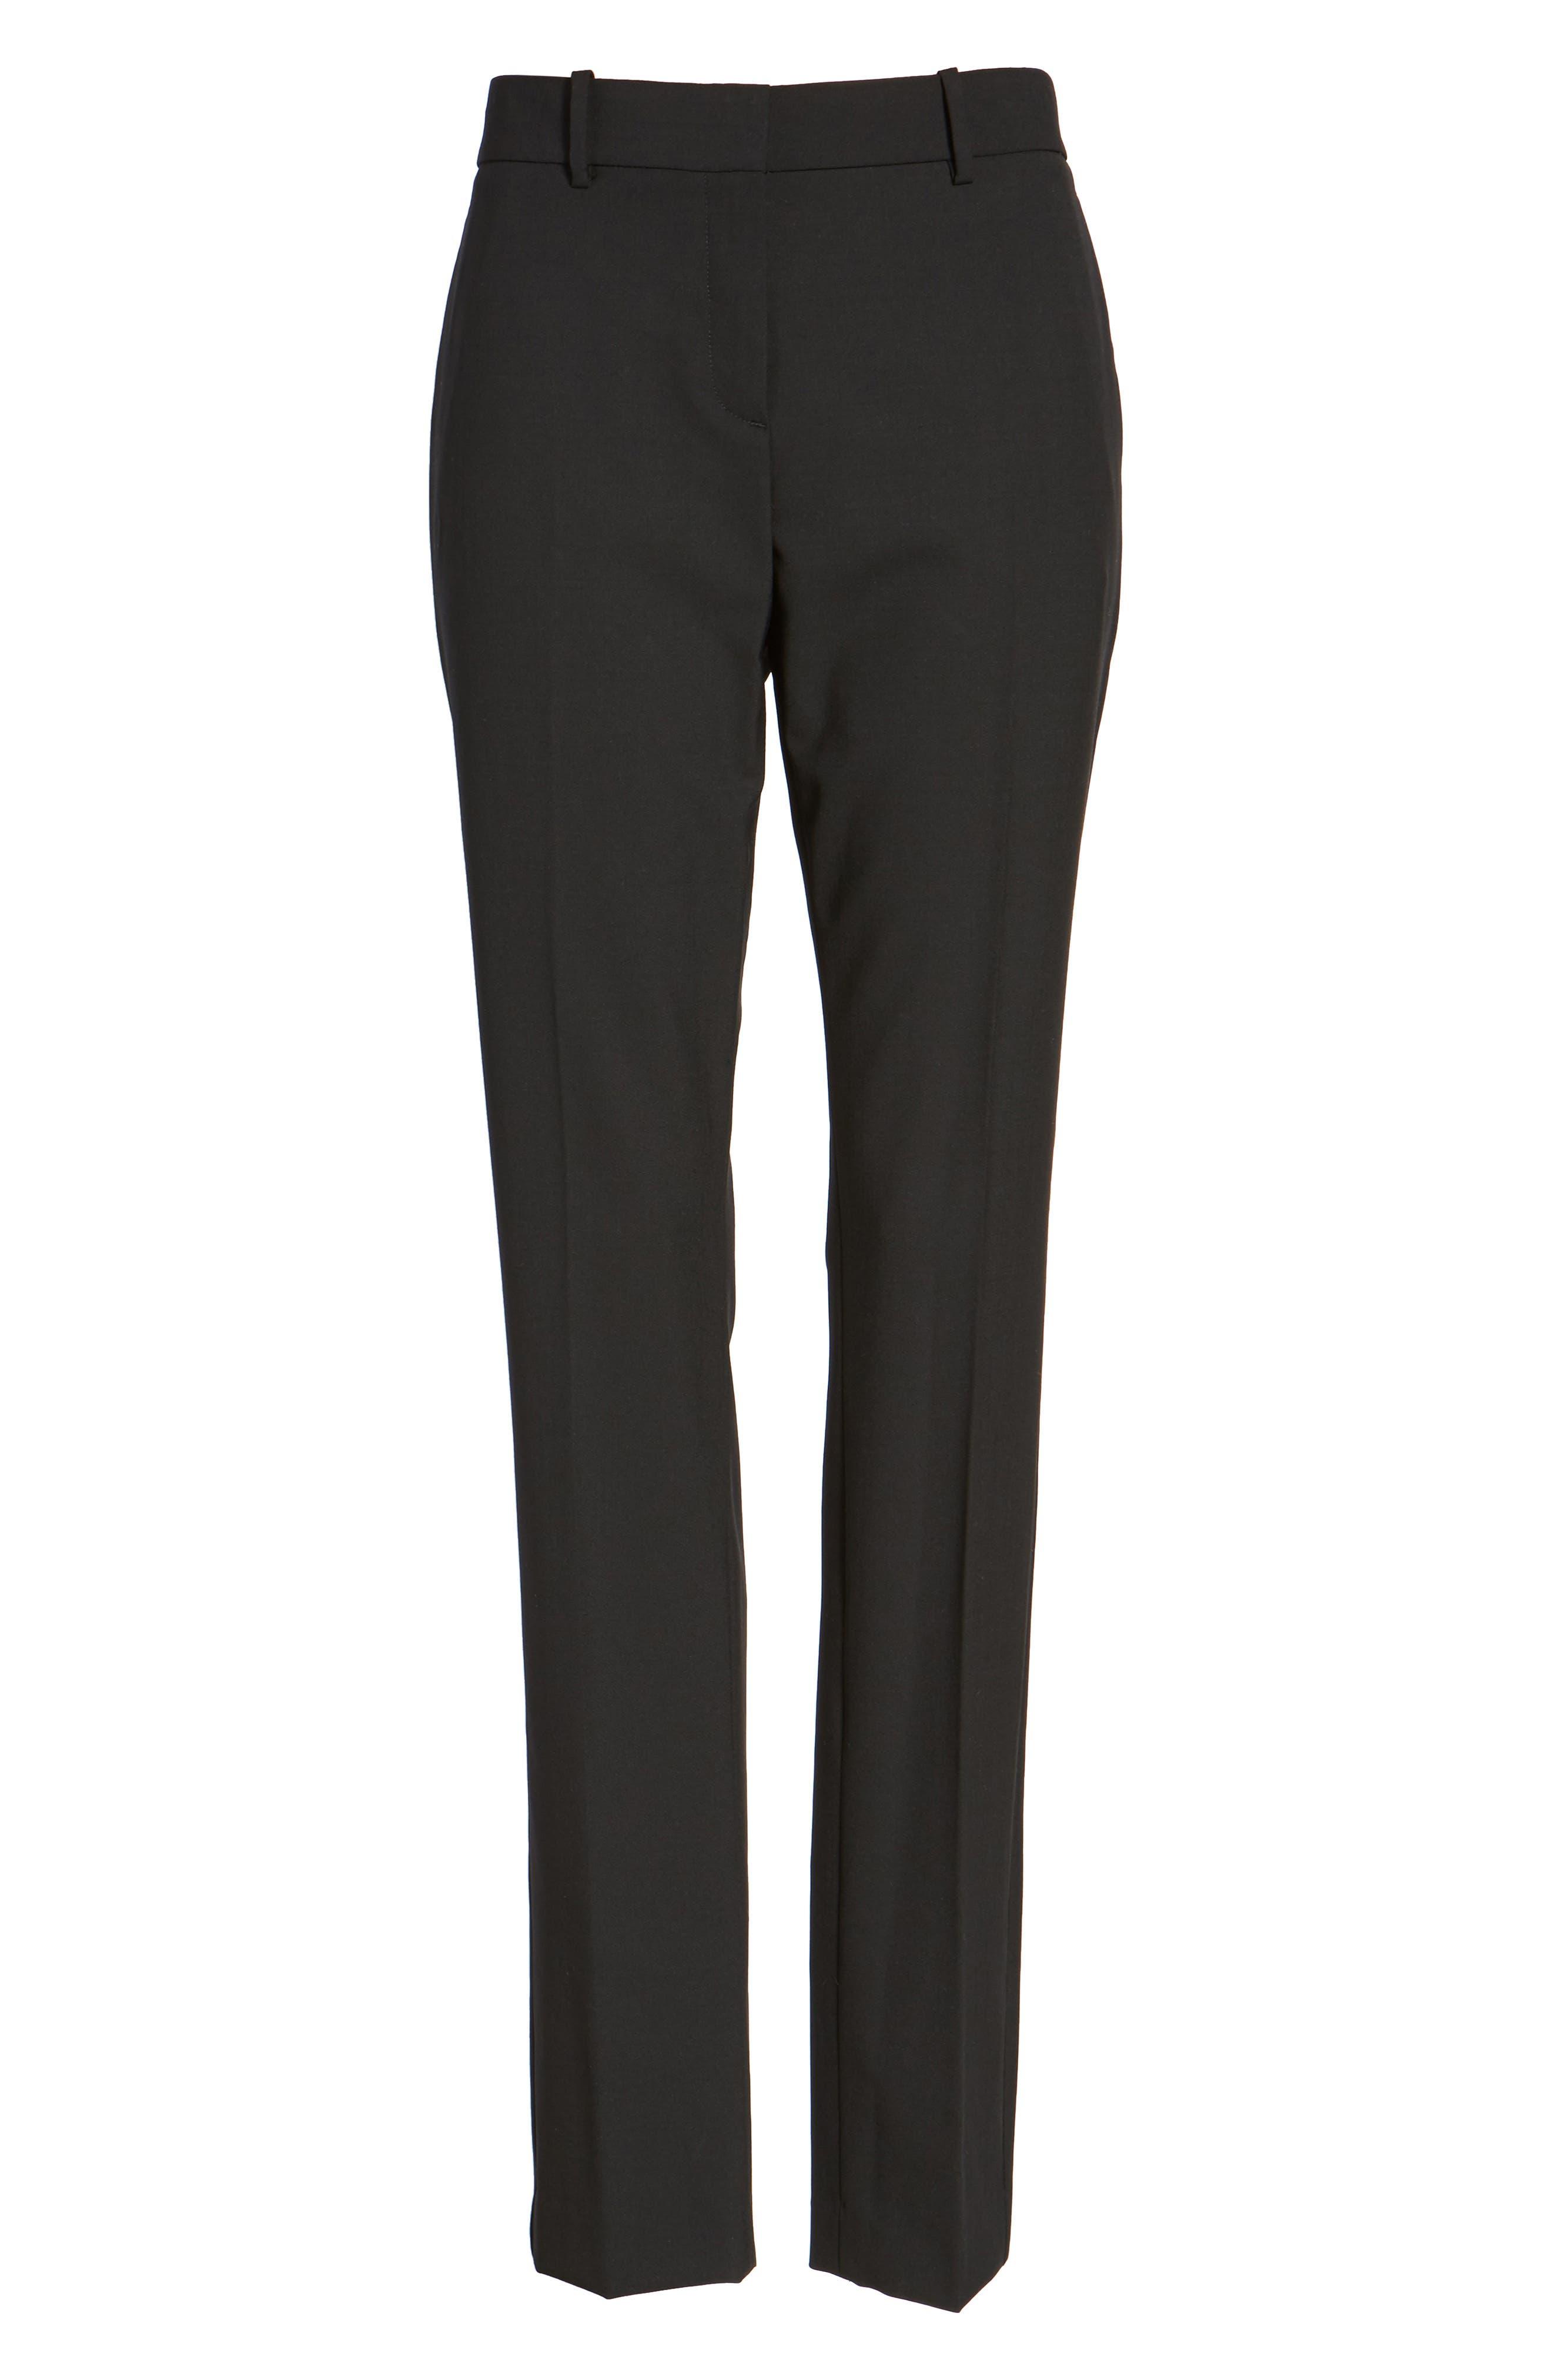 Theory 'Super Slim Edition' Stretch Wool Pants